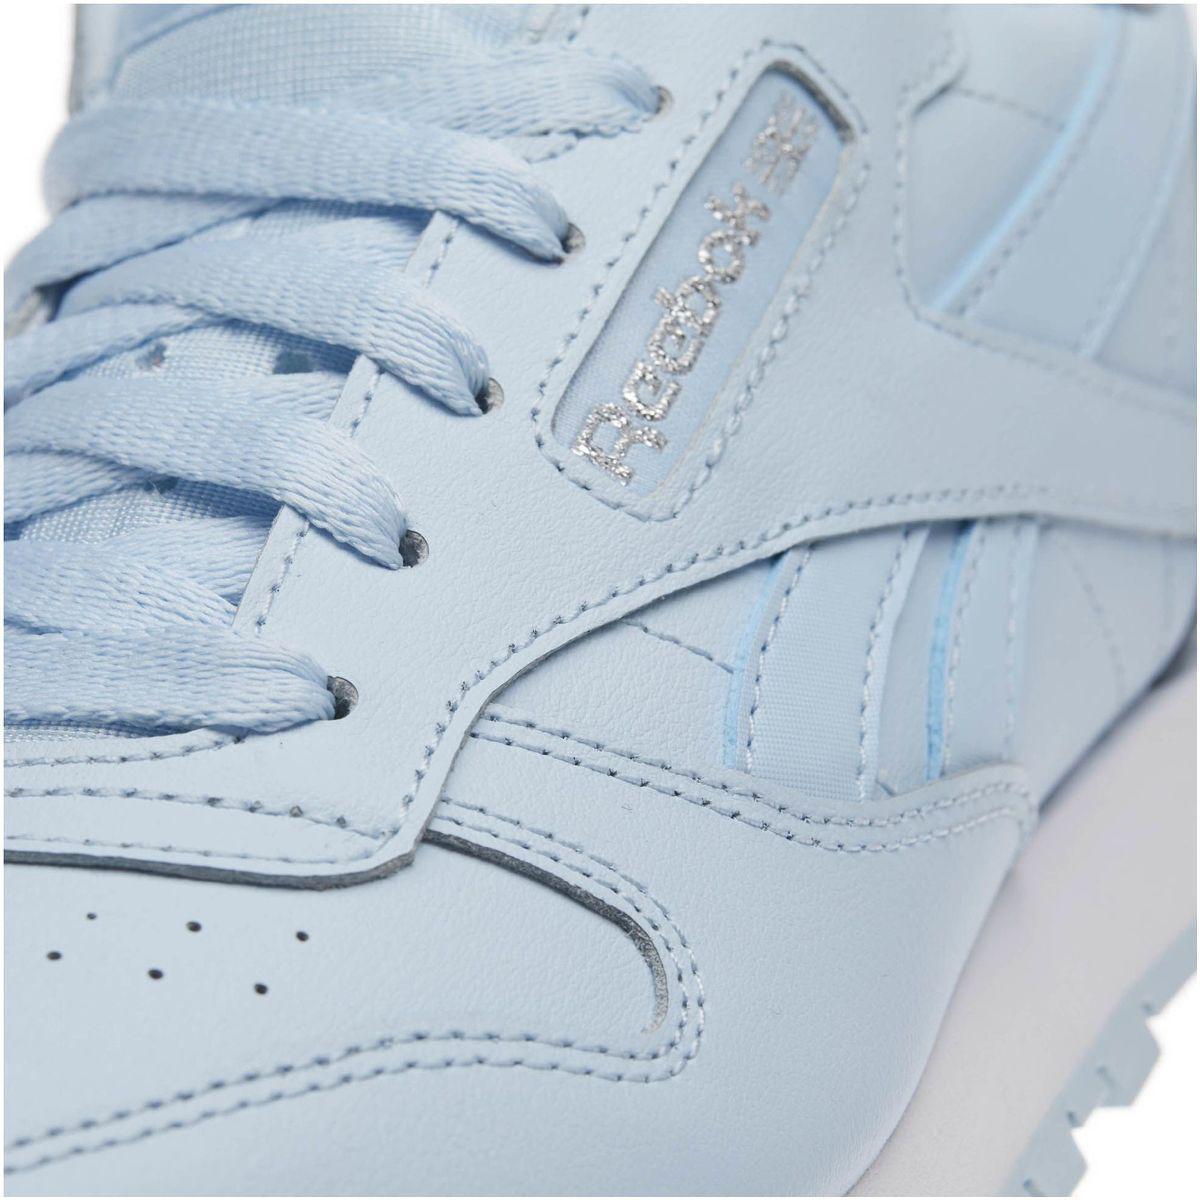 336e681e2f6 Reebok - Classic Leather Pastel - Primaria Women s Shoes (trainers) In Blue  - Lyst. View fullscreen